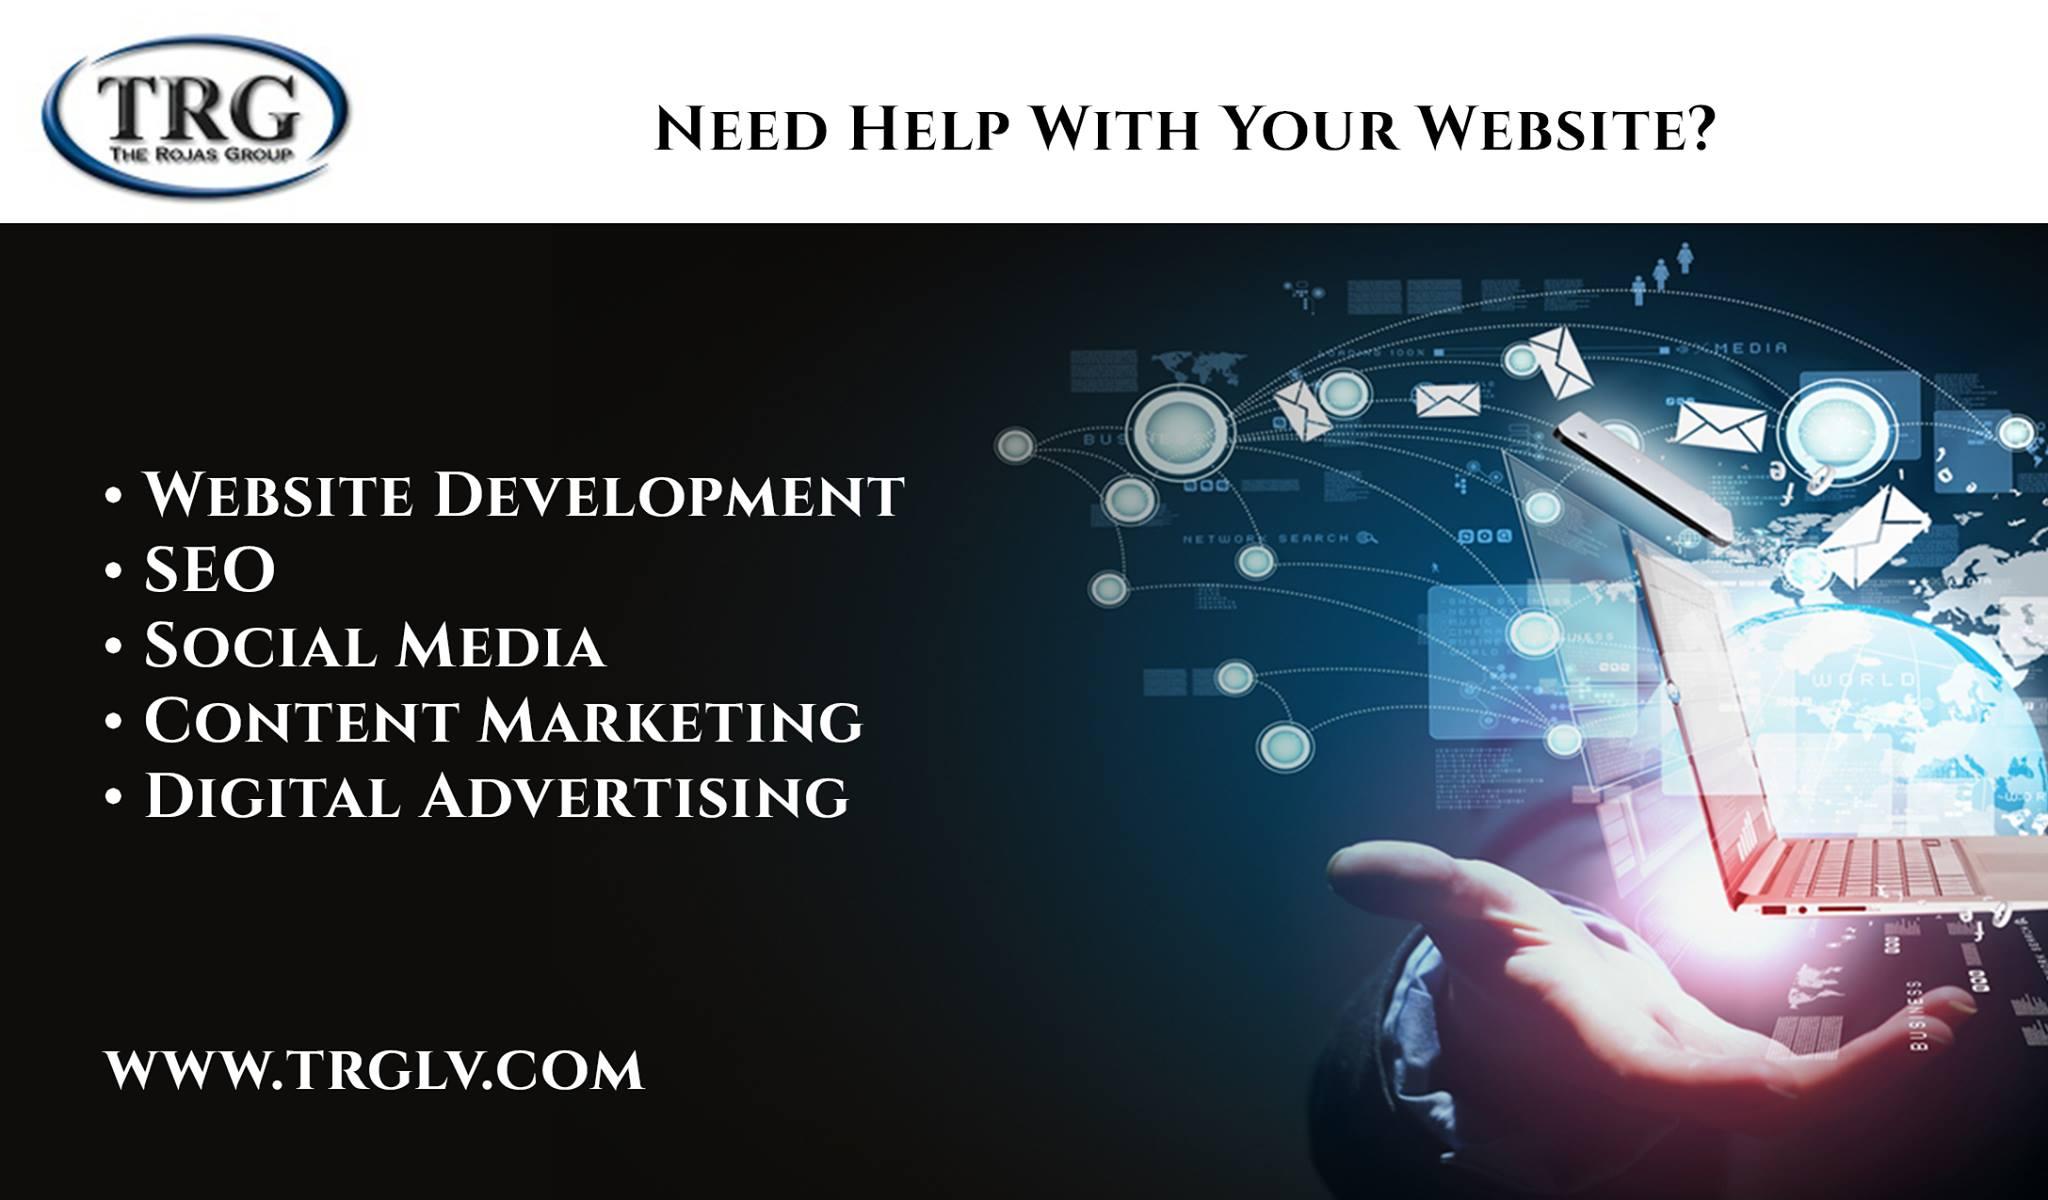 The Rojas Group TRGLV, Inc Social Media Website Development Services in Las Vegas